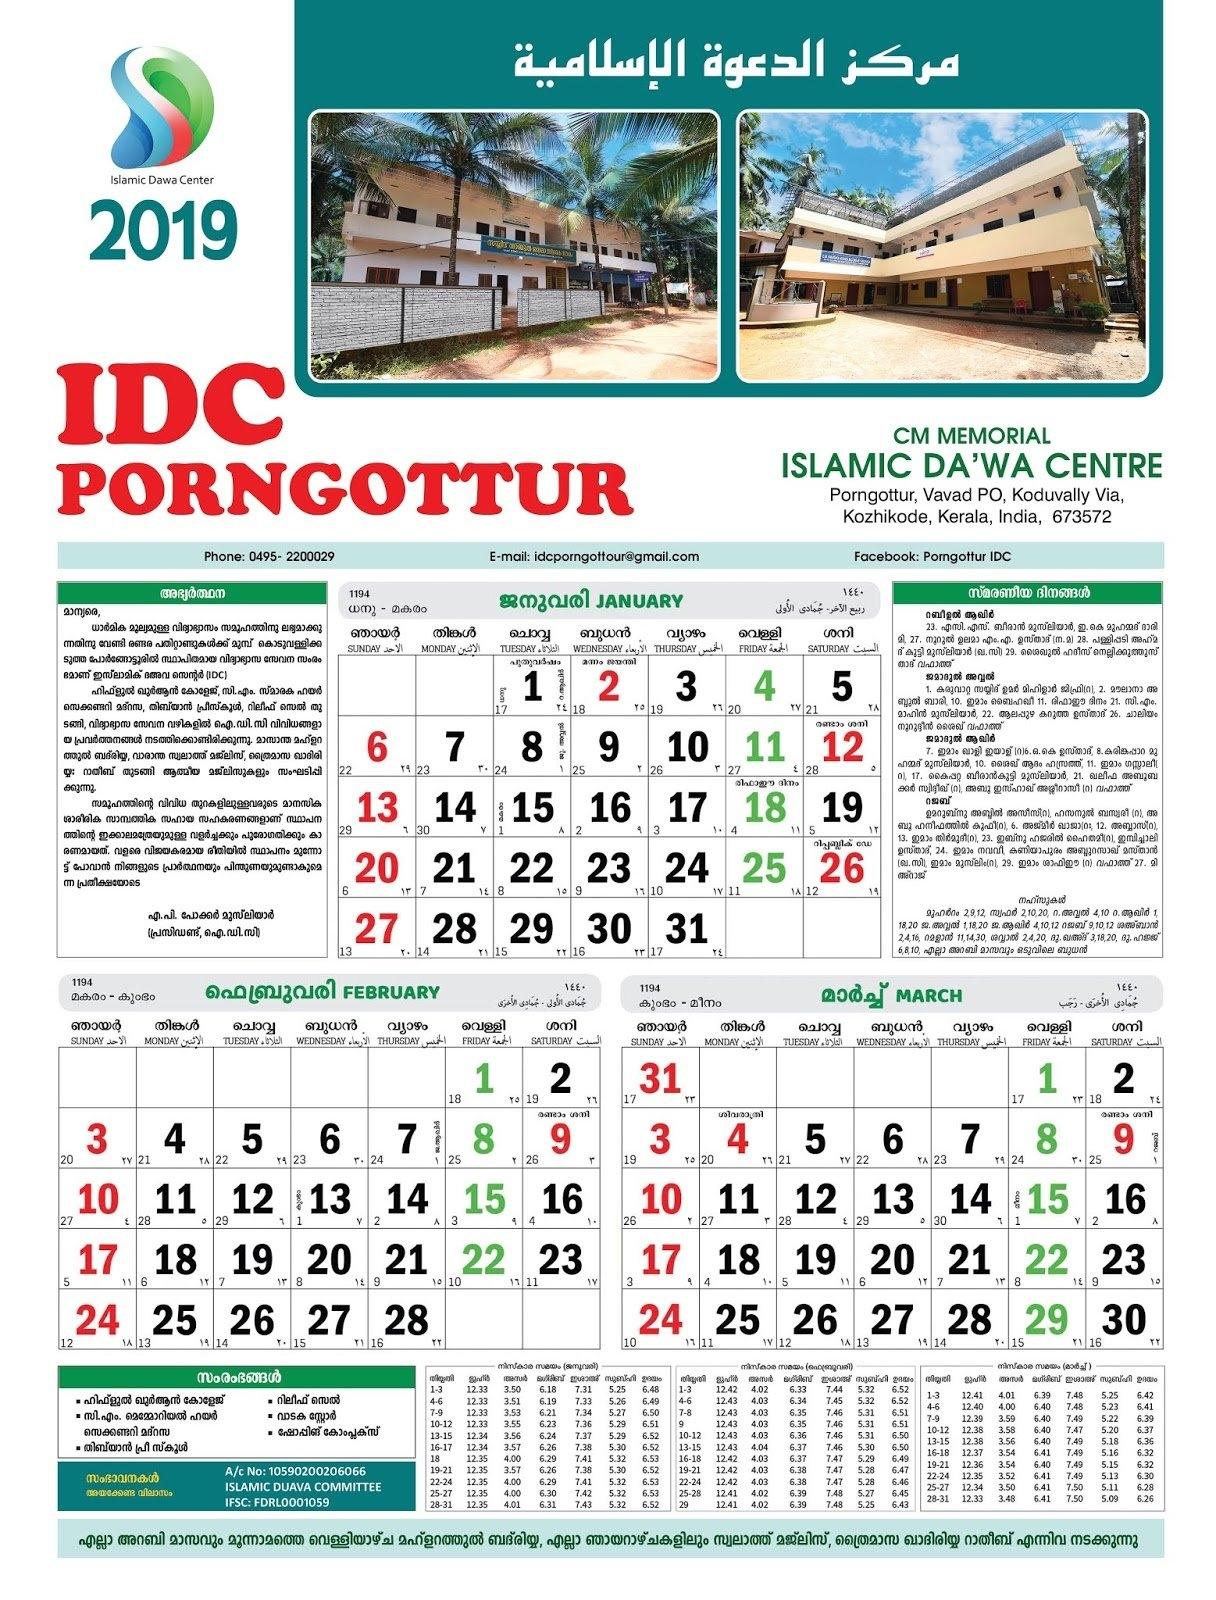 Image Gallery : Calendar 2019 Ck Design Parambil Peedika C&k Calendar 2019